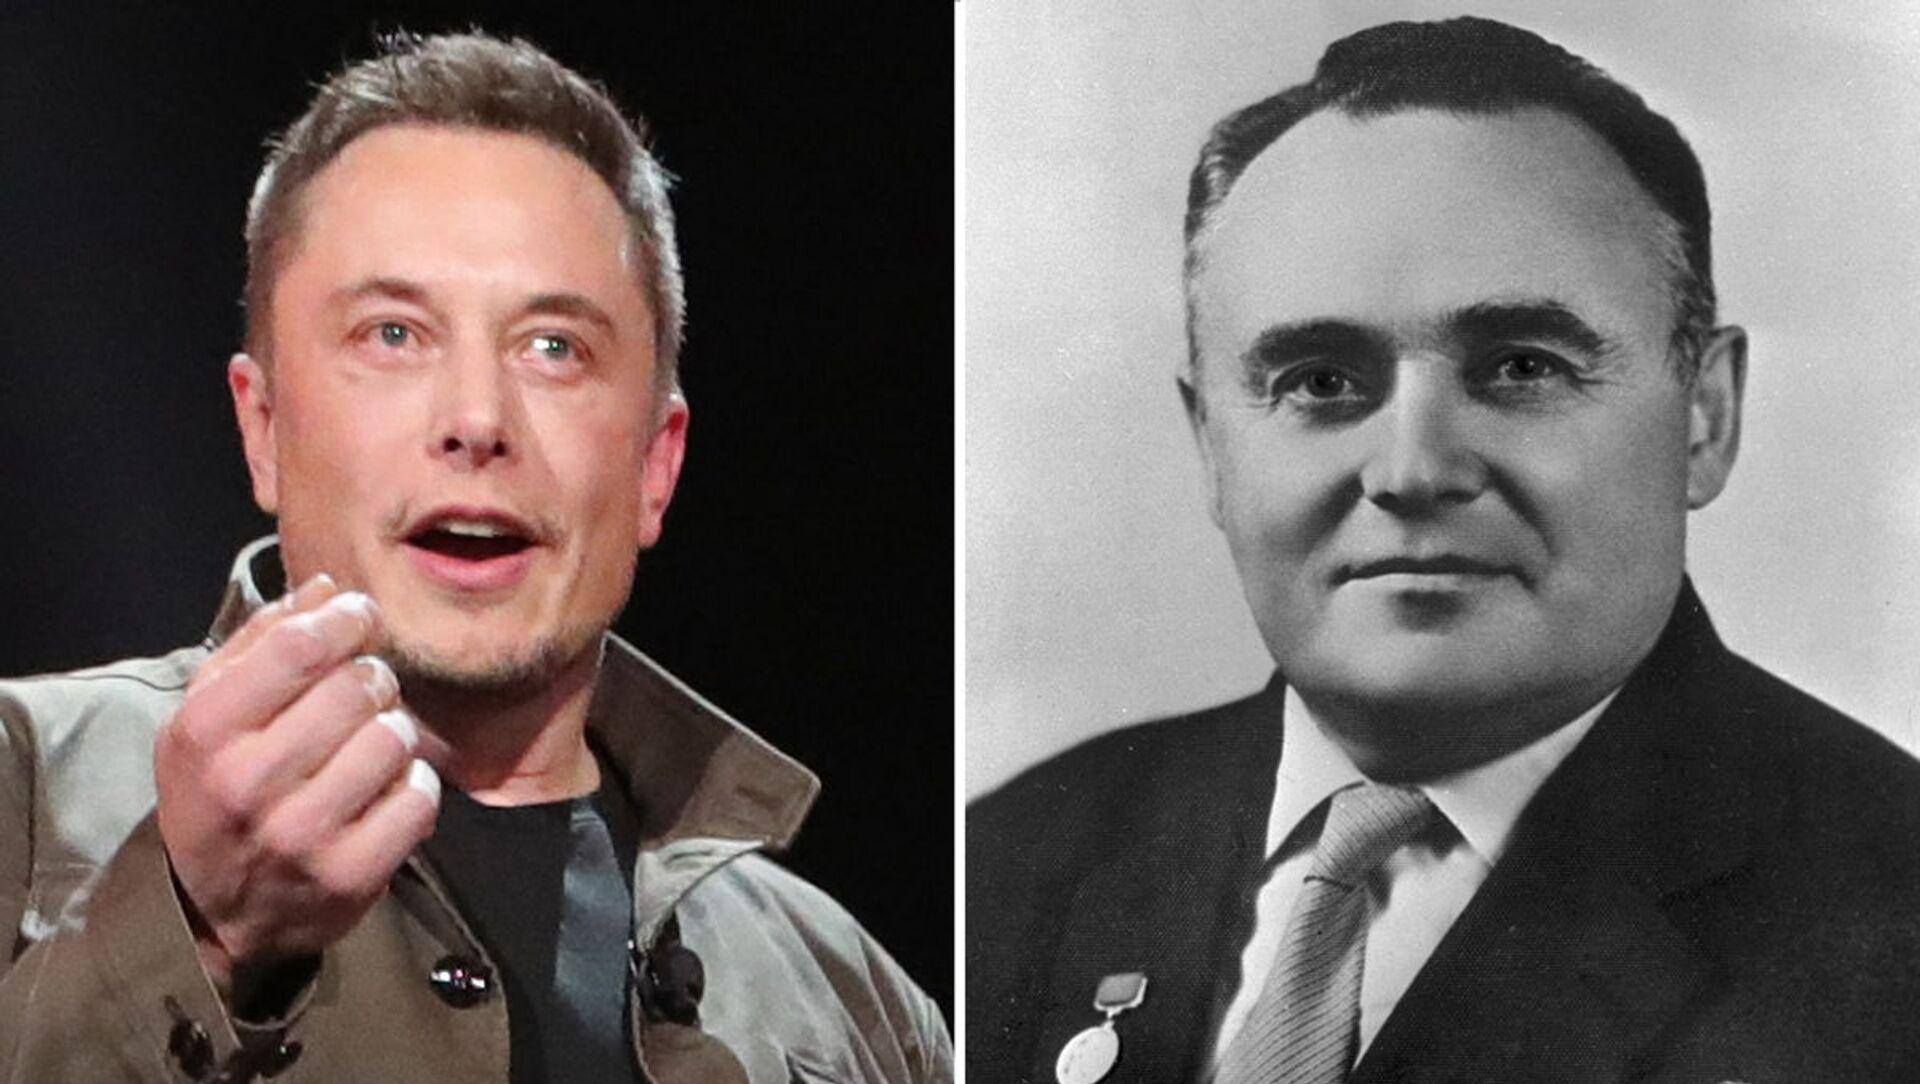 Elon Musk, fundador de SpaceX, y Seguéi Korolióv, ingeniero de cohetes soviético - Sputnik Mundo, 1920, 12.01.2021